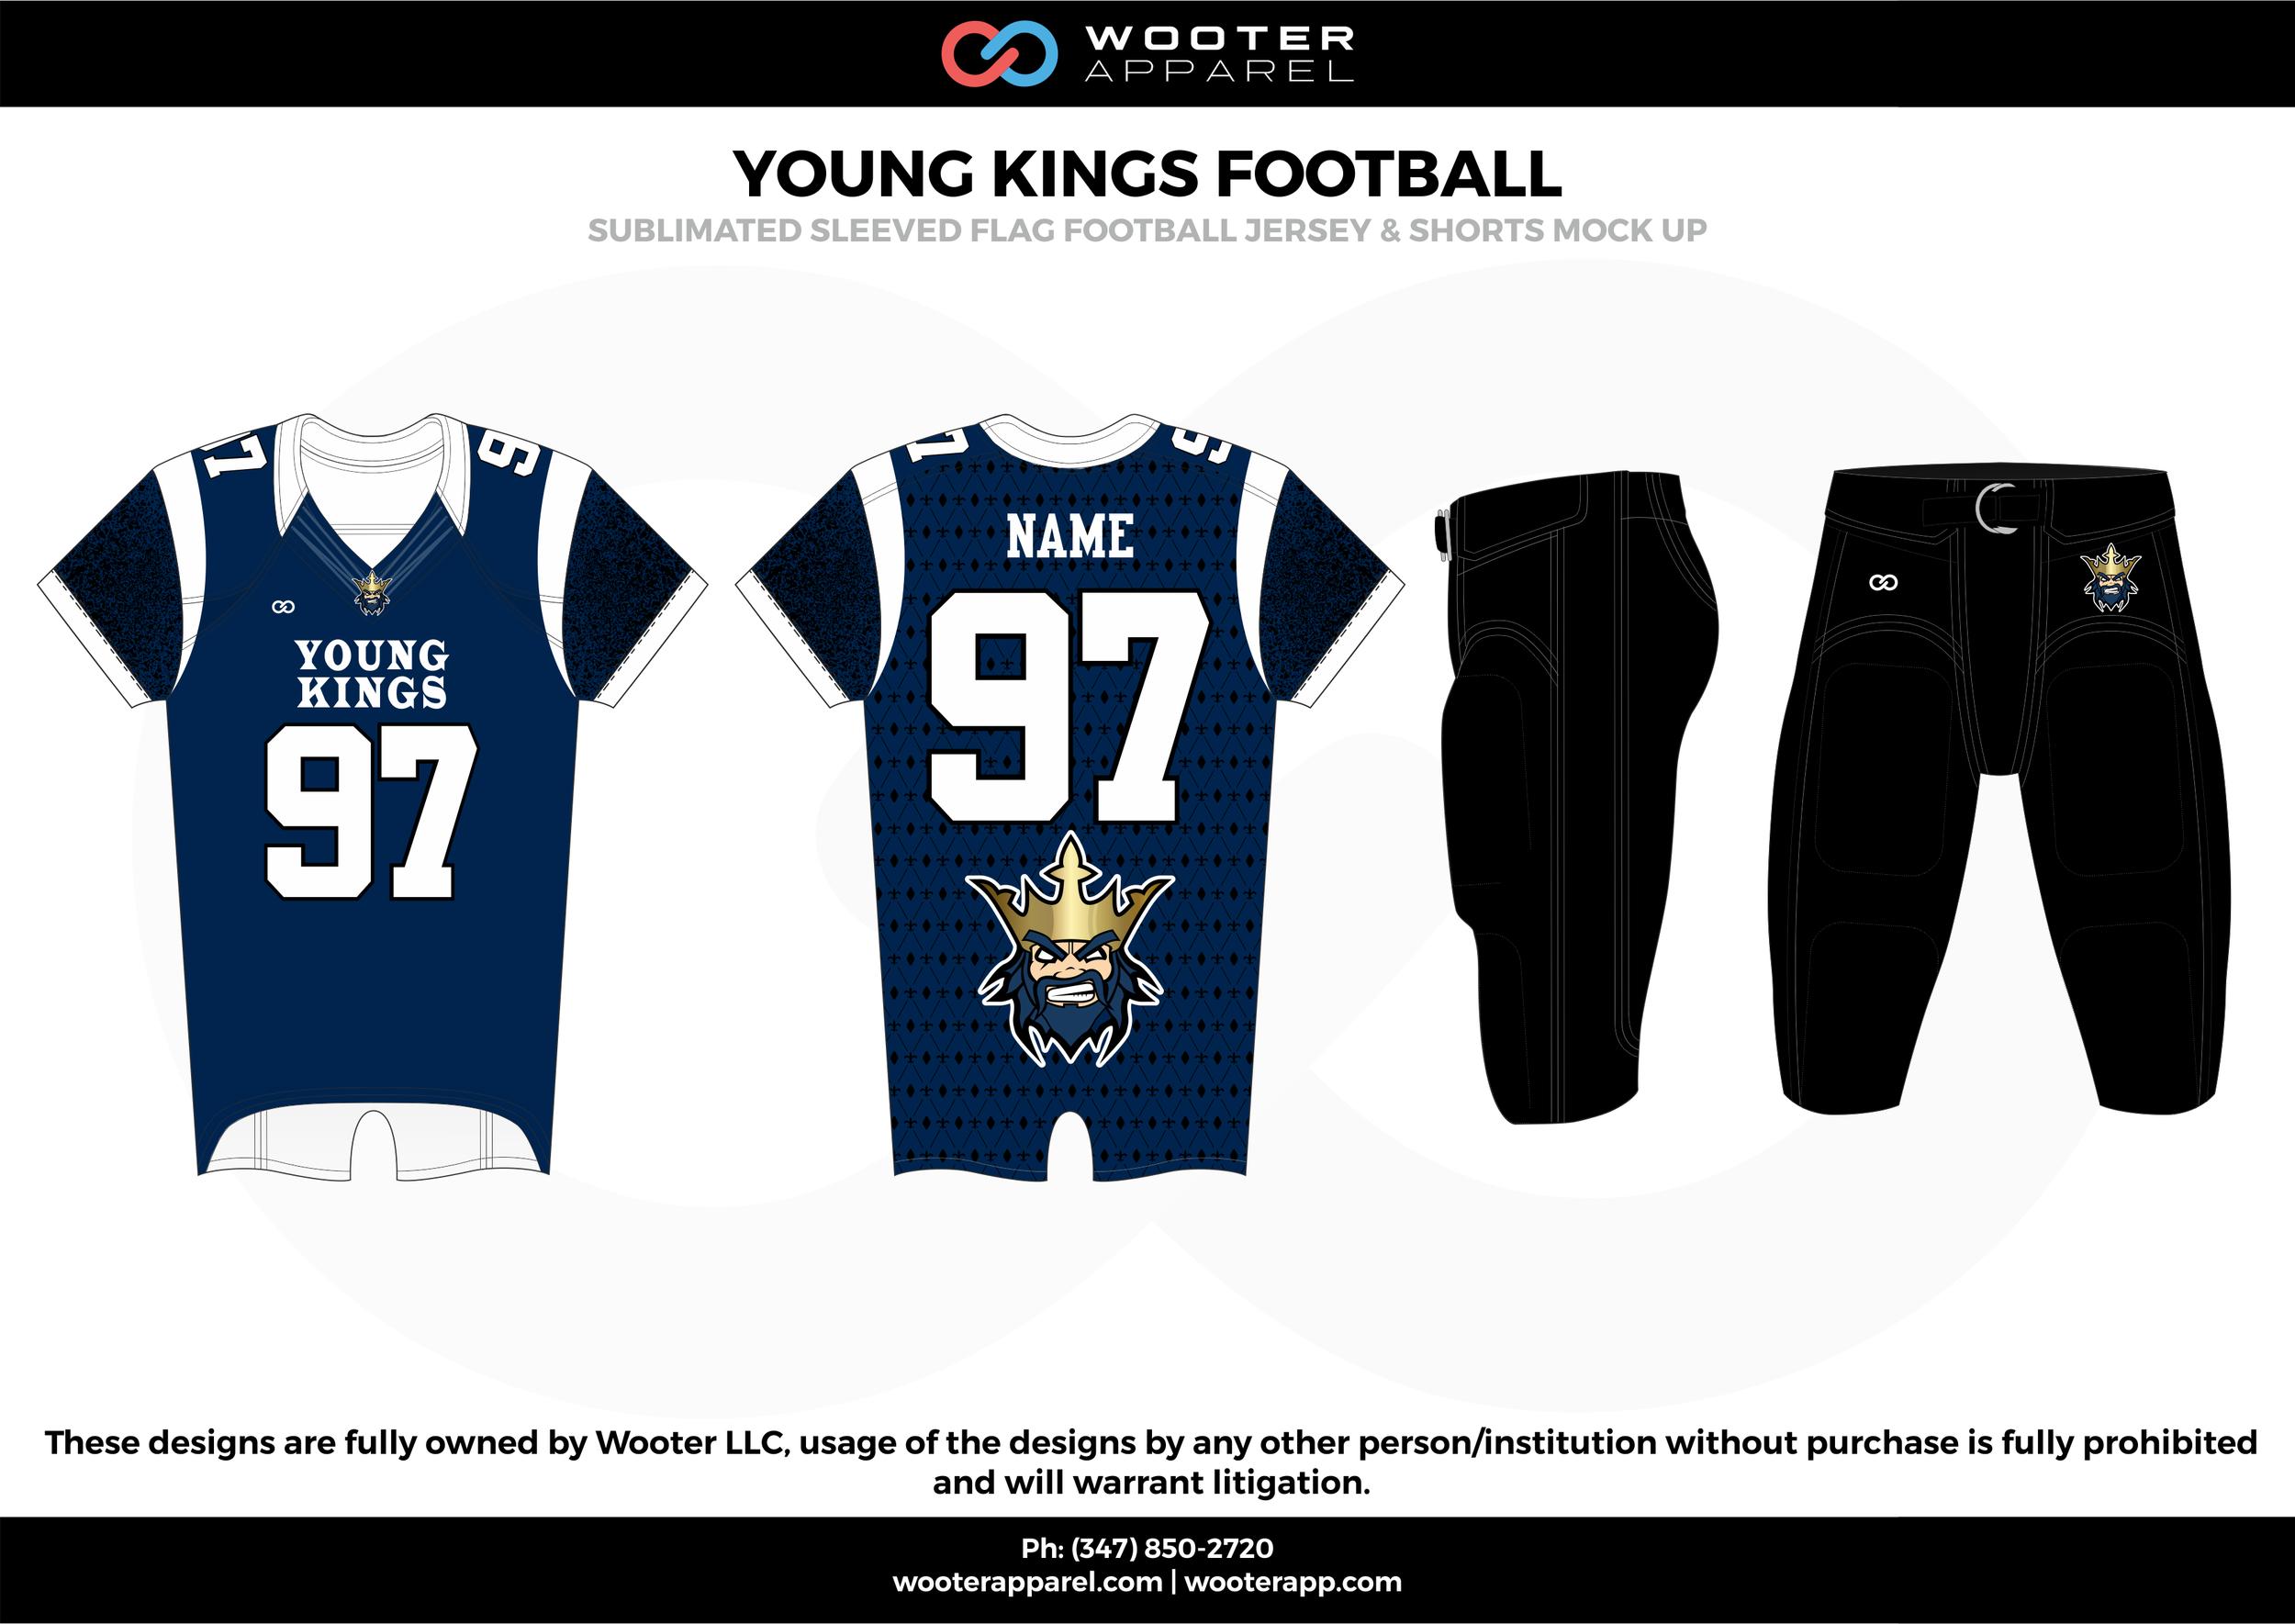 YOUNG KINGS FOOTBALL blue black white flag football uniforms jerseys pants